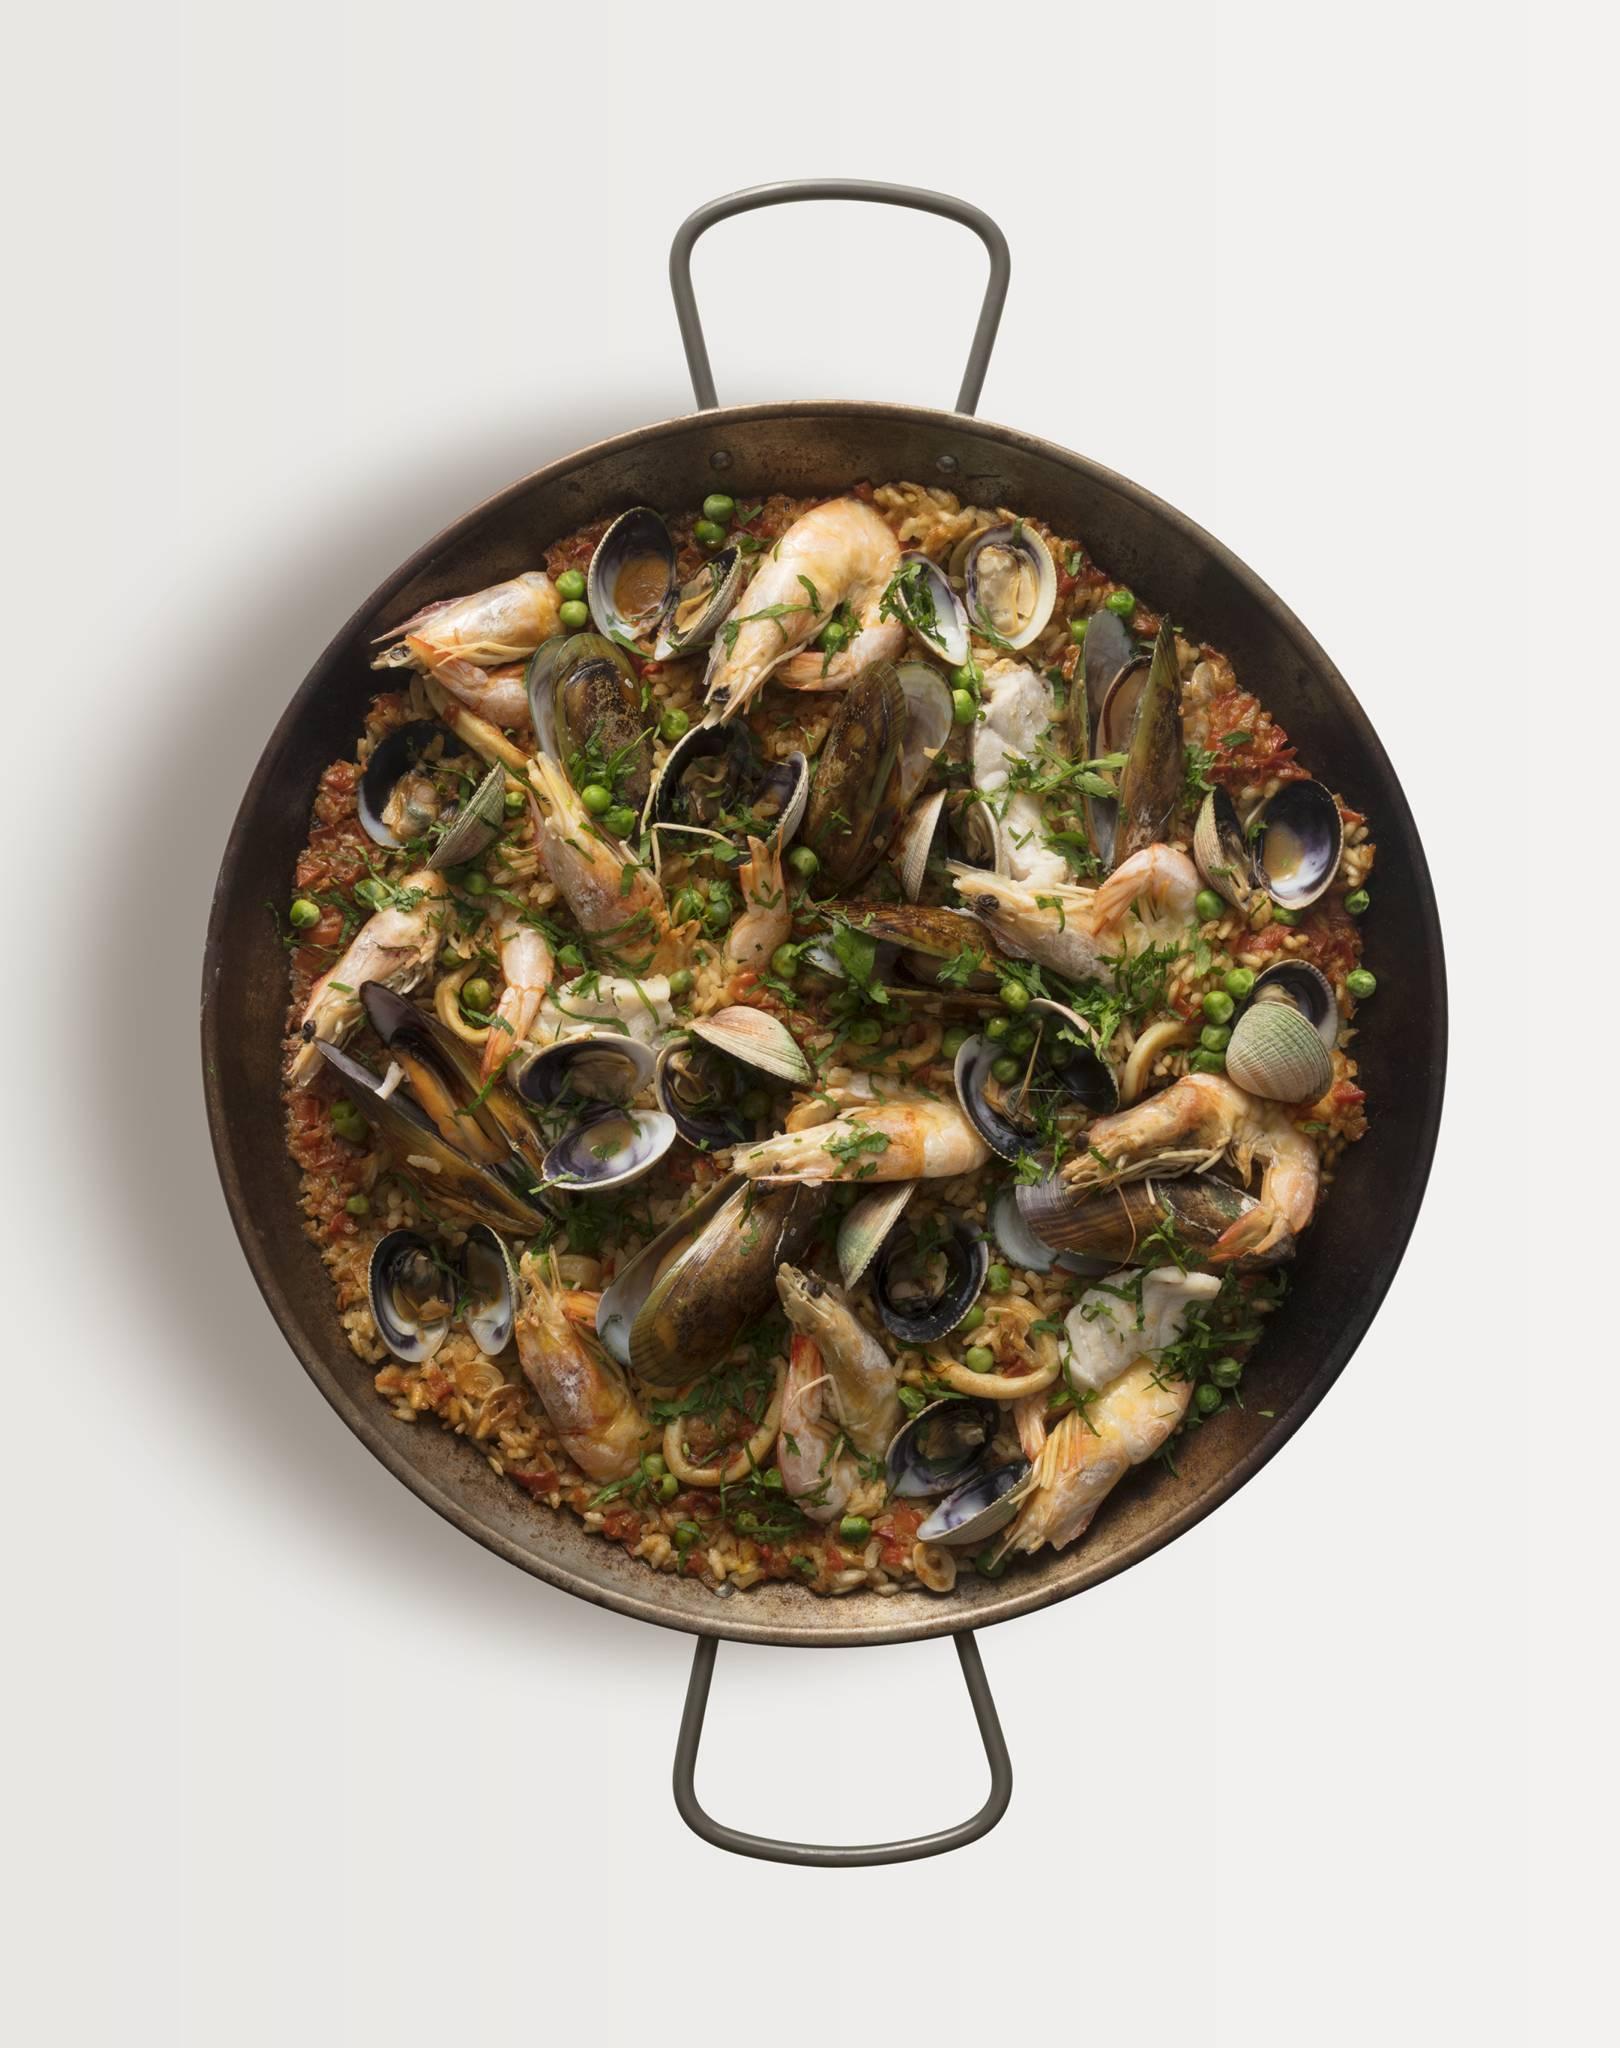 Jose Pizarro's seafood paella